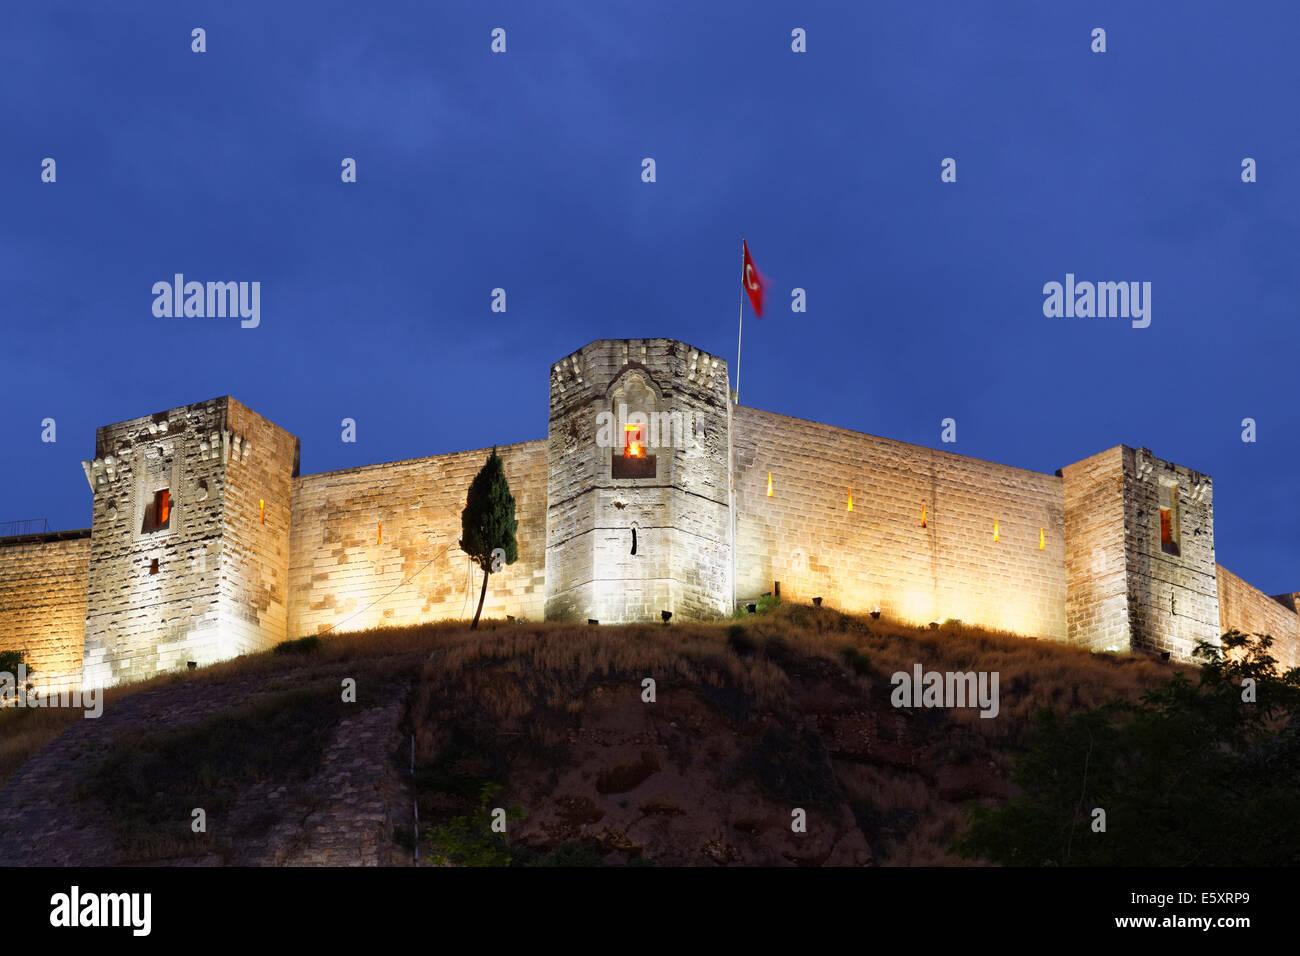 Citadel, Gaziantep, Southeastern Anatolia Region, Anatolia, Turkey - Stock Image